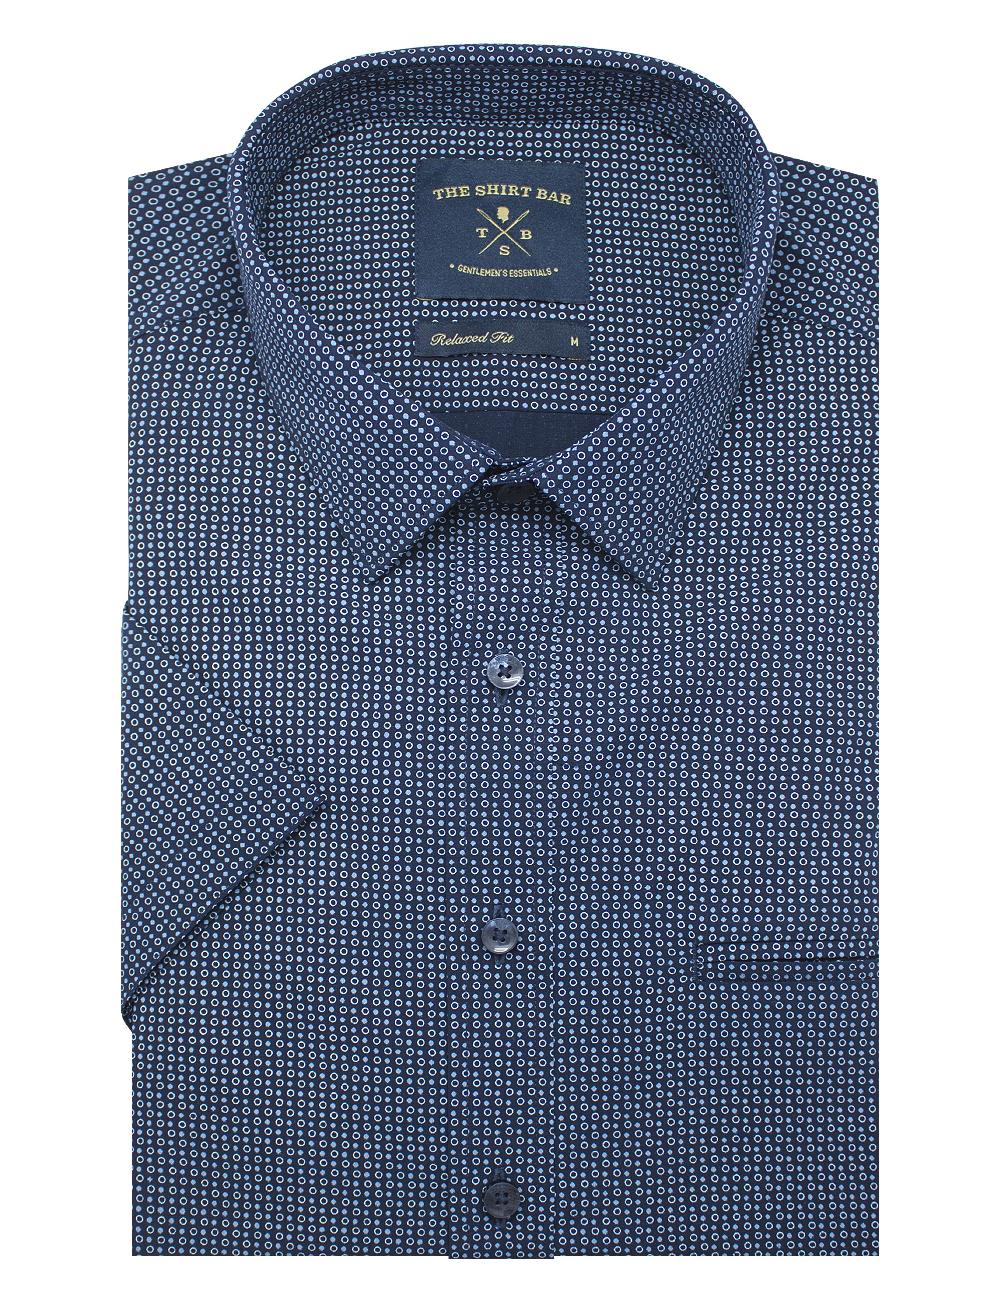 Navy Circle Print Eco-ol Bamboo Custom / Relaxed Fit Short Sleeve Shirt – RF9SNB13.21